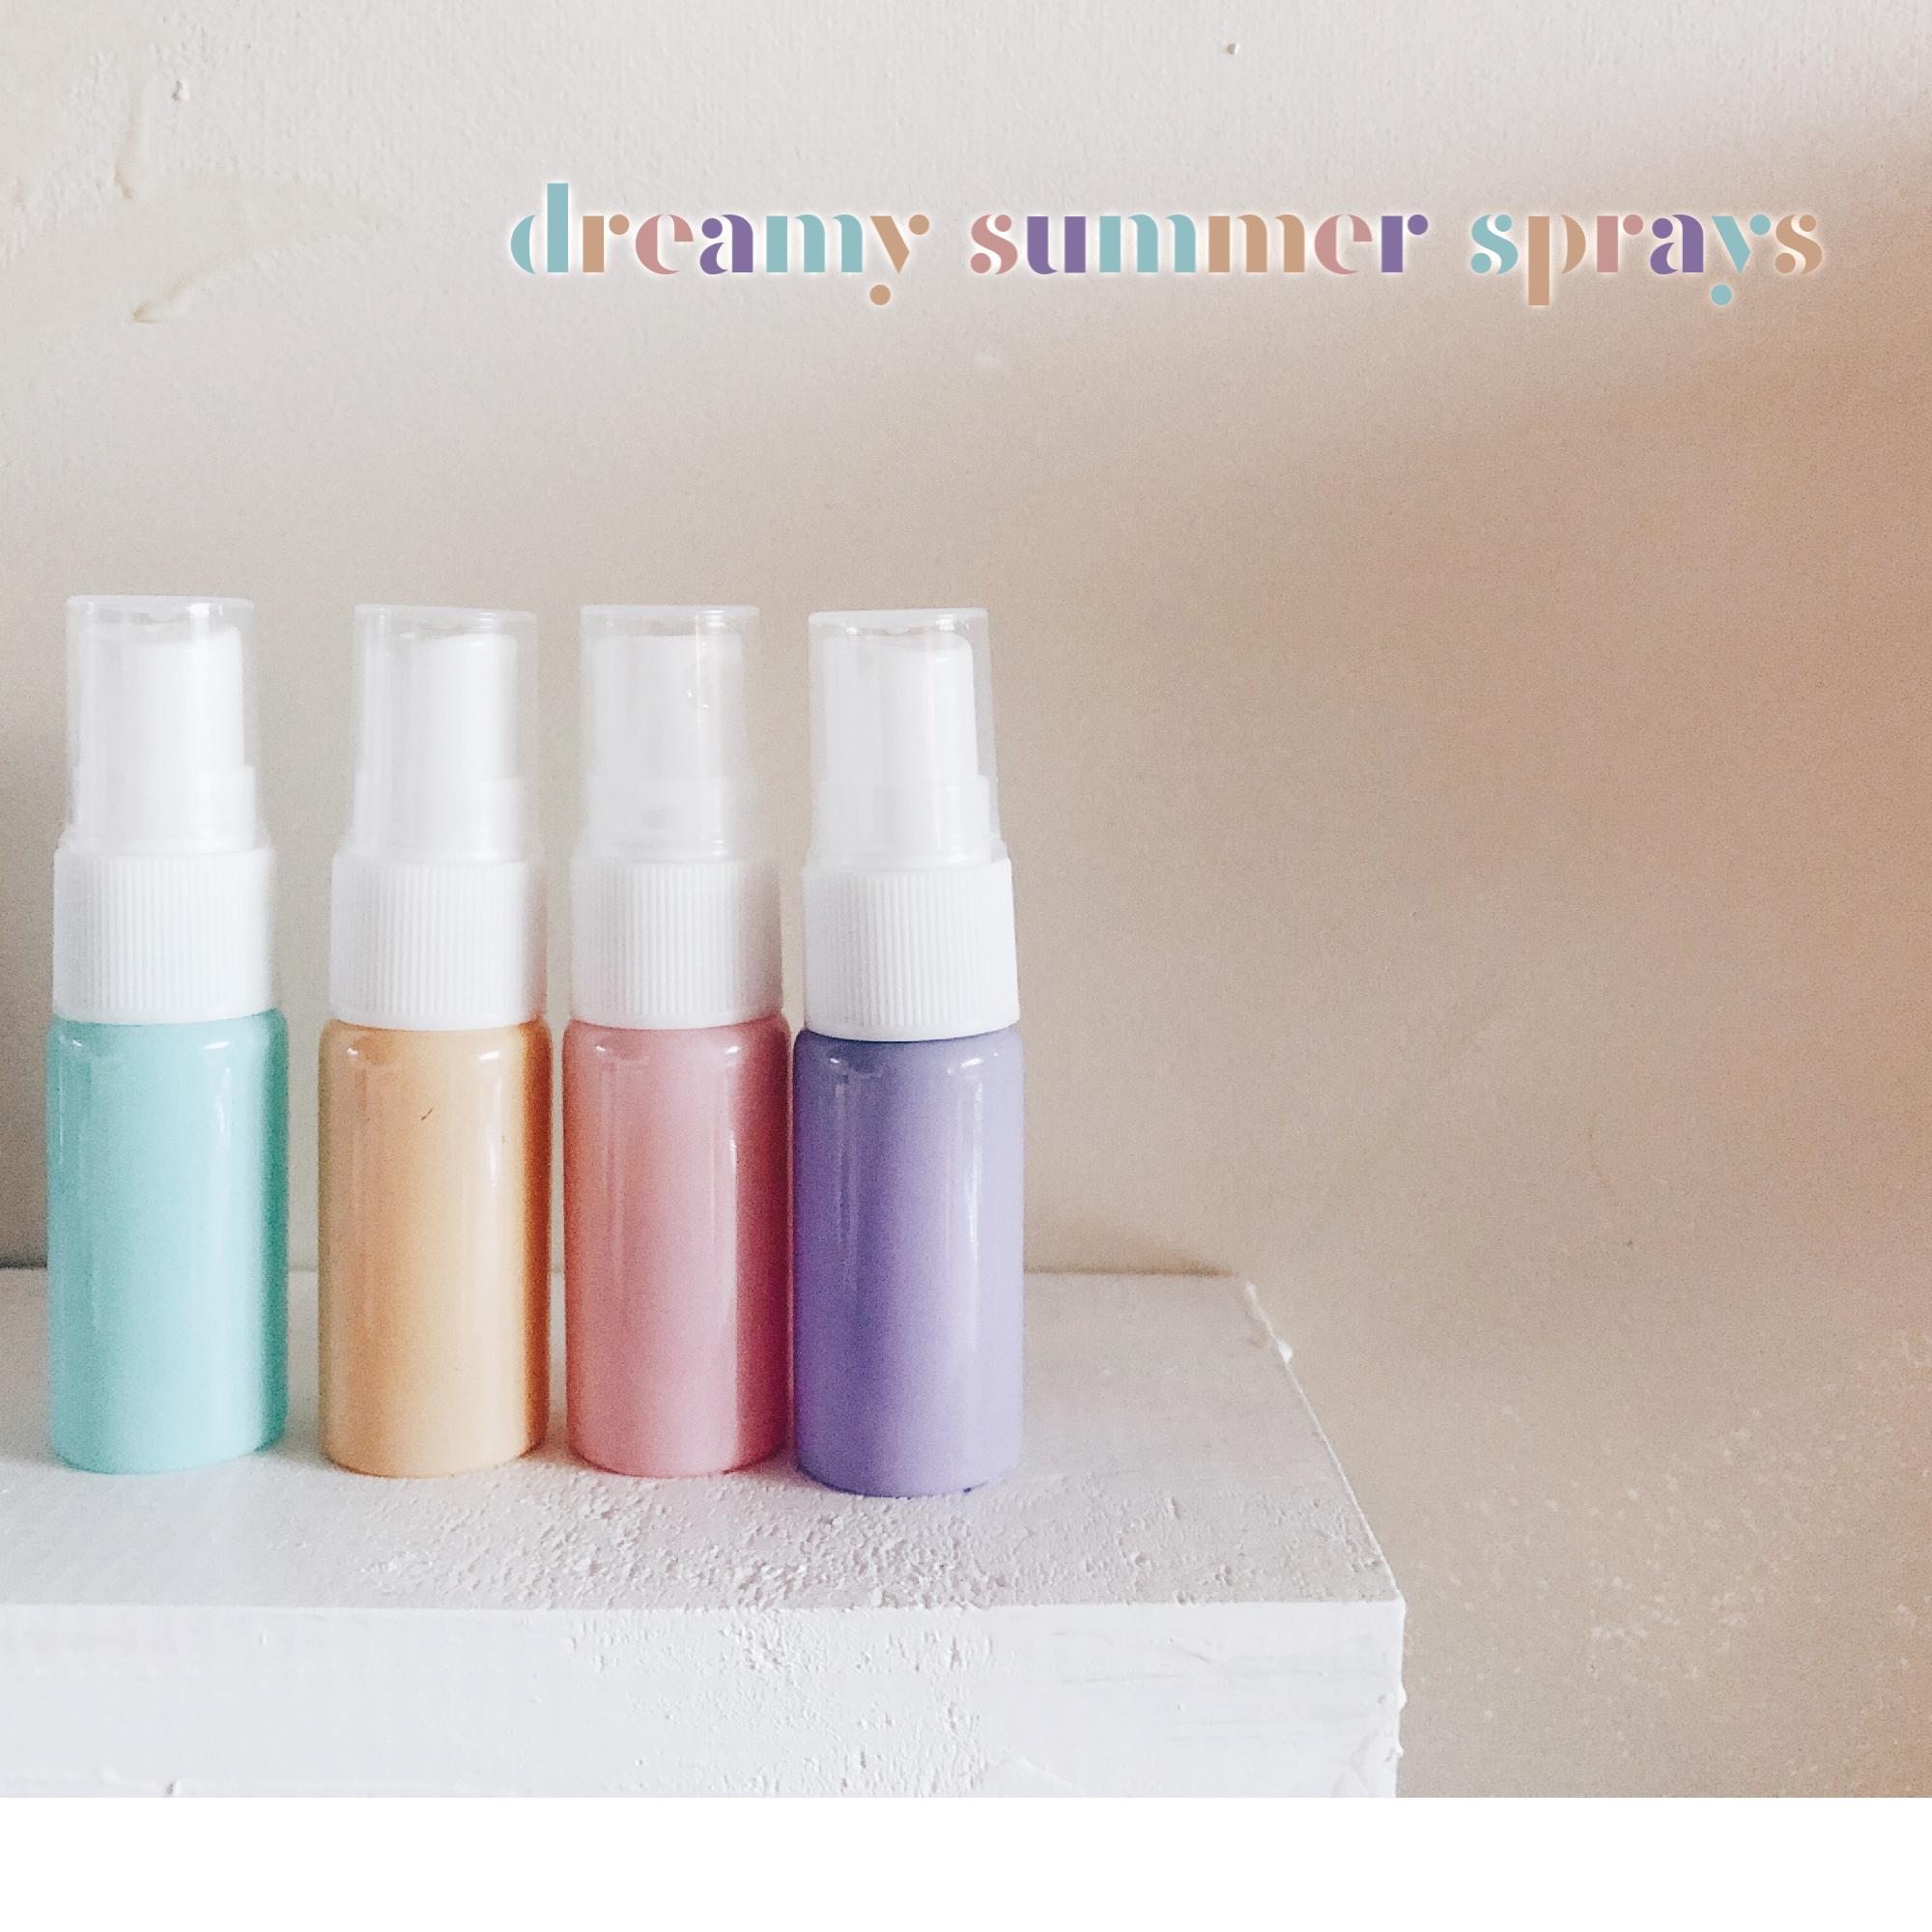 sprayrecipes-july.png